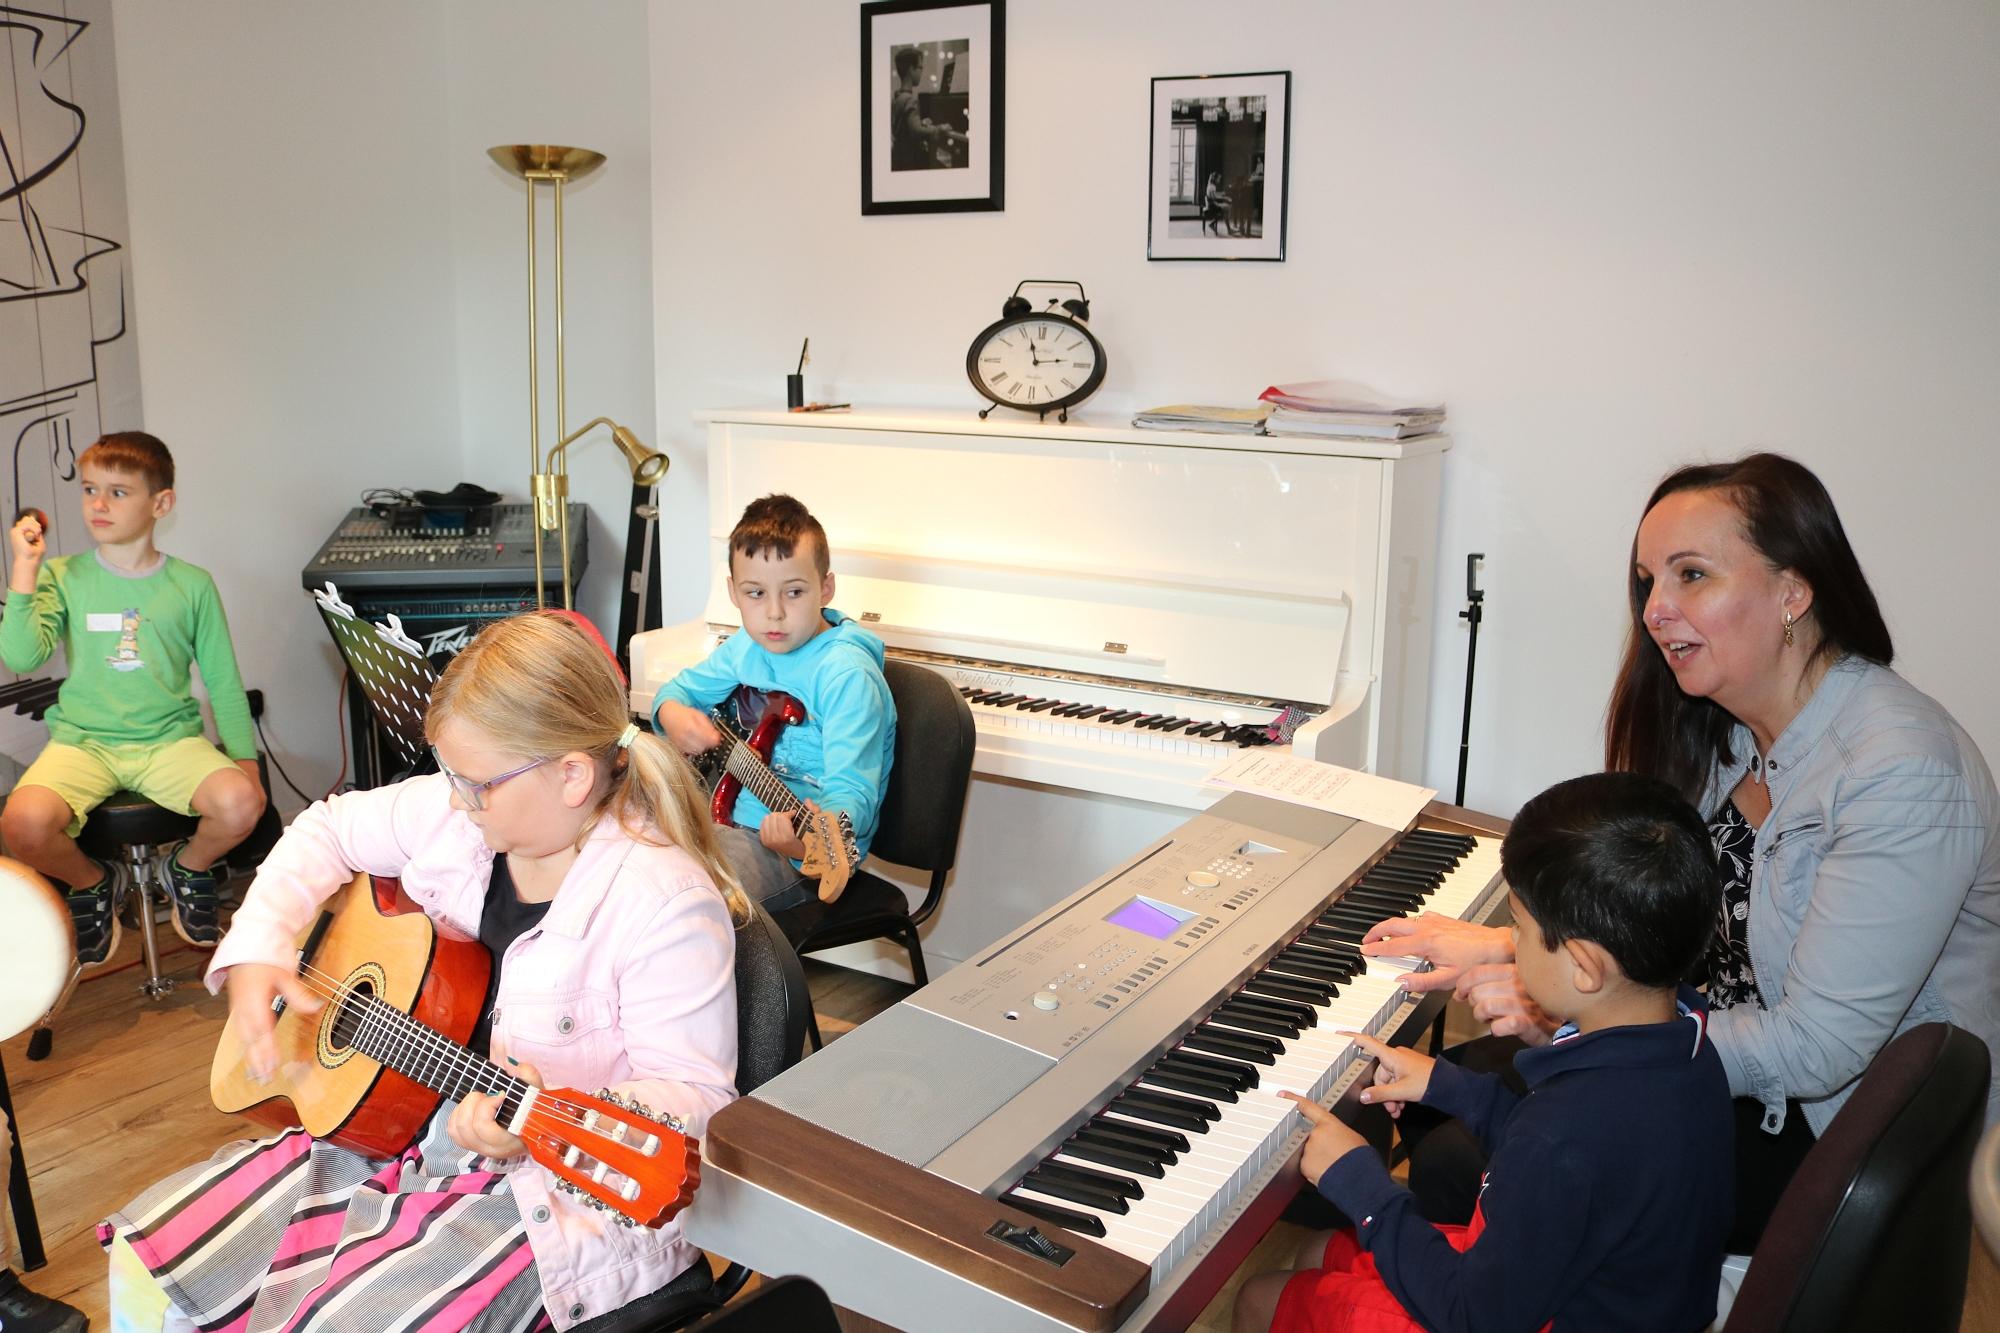 202007 Bandprobe FP Musikschule Harmonie 8